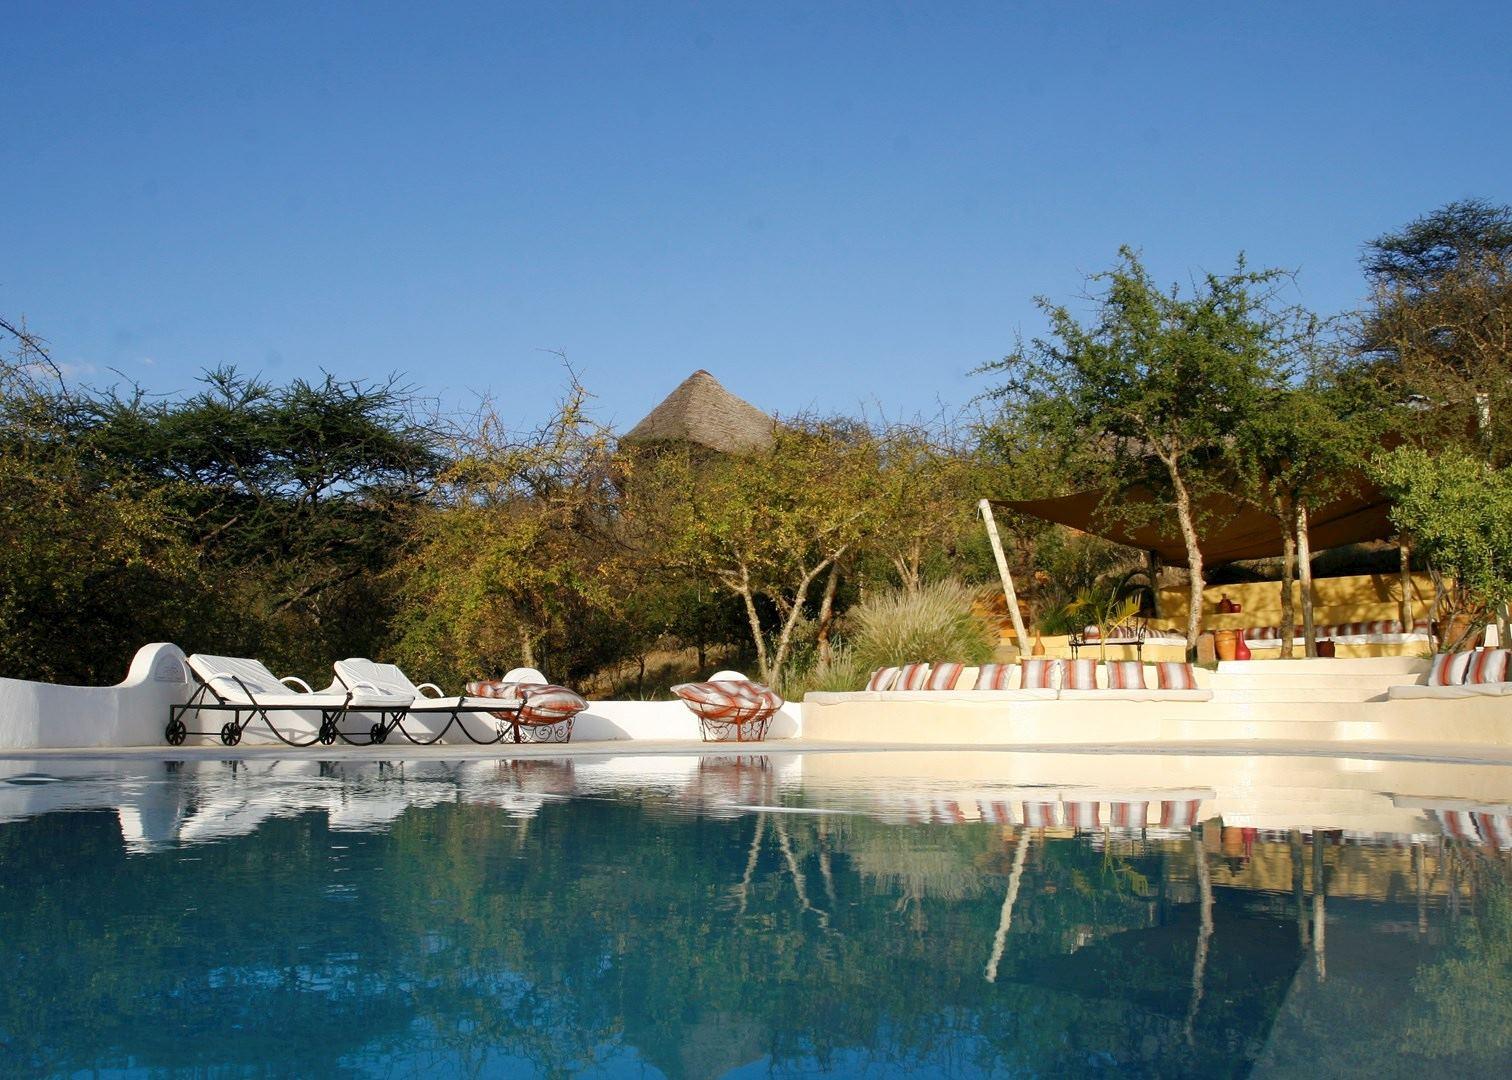 Sasaab Samburu National Reserve Hotels Audley Travel